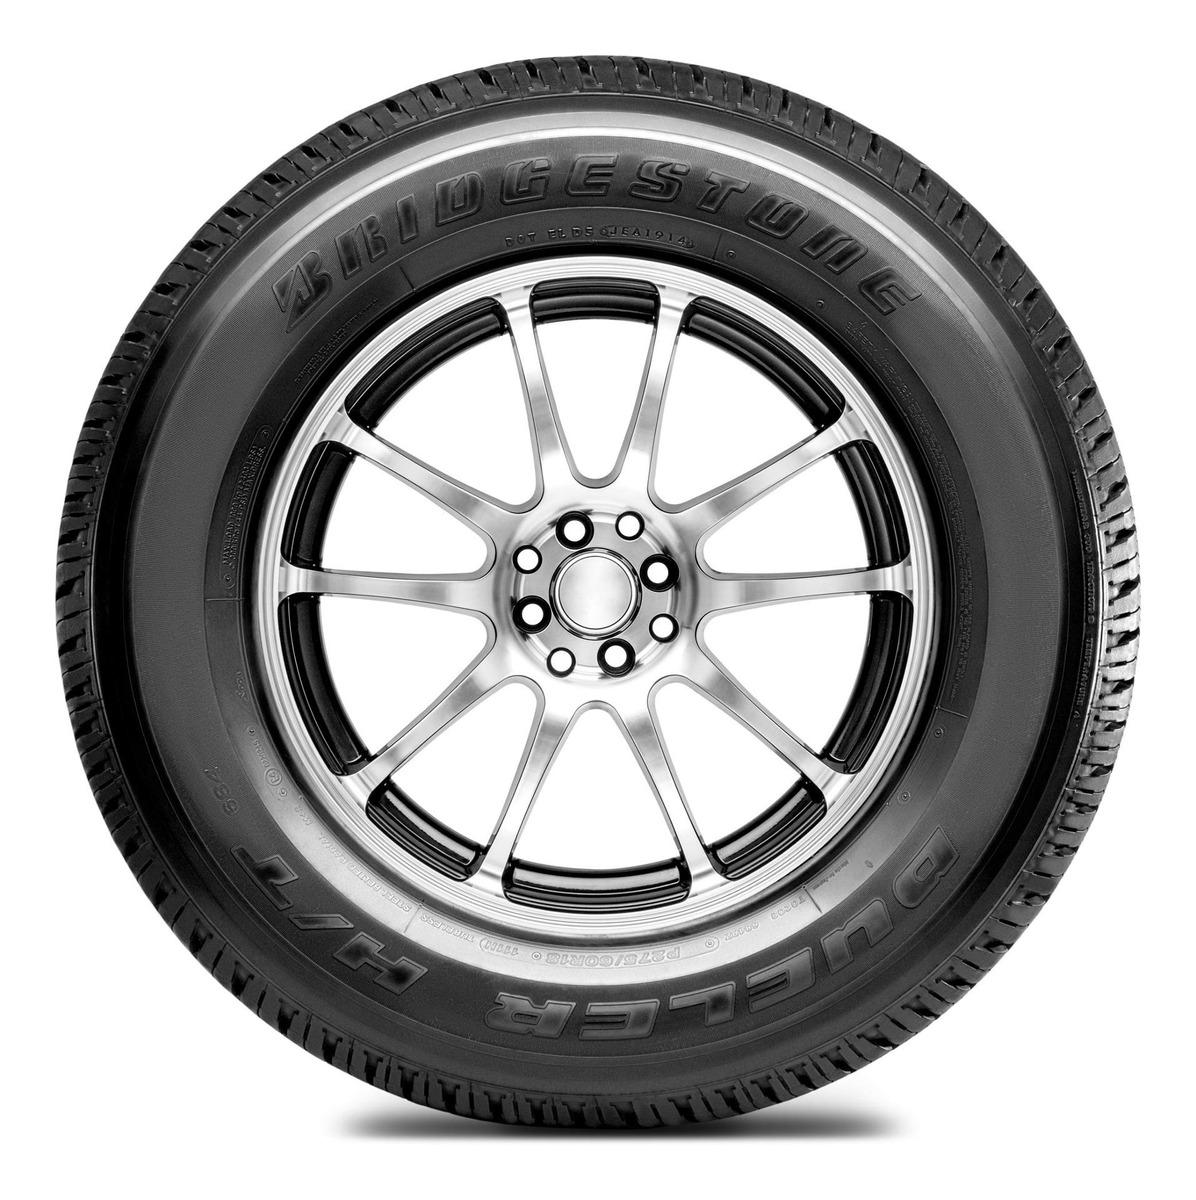 Neumático 245/70R16 111T DUELER H/T 684 III ECOPIA BRIDGESTONE